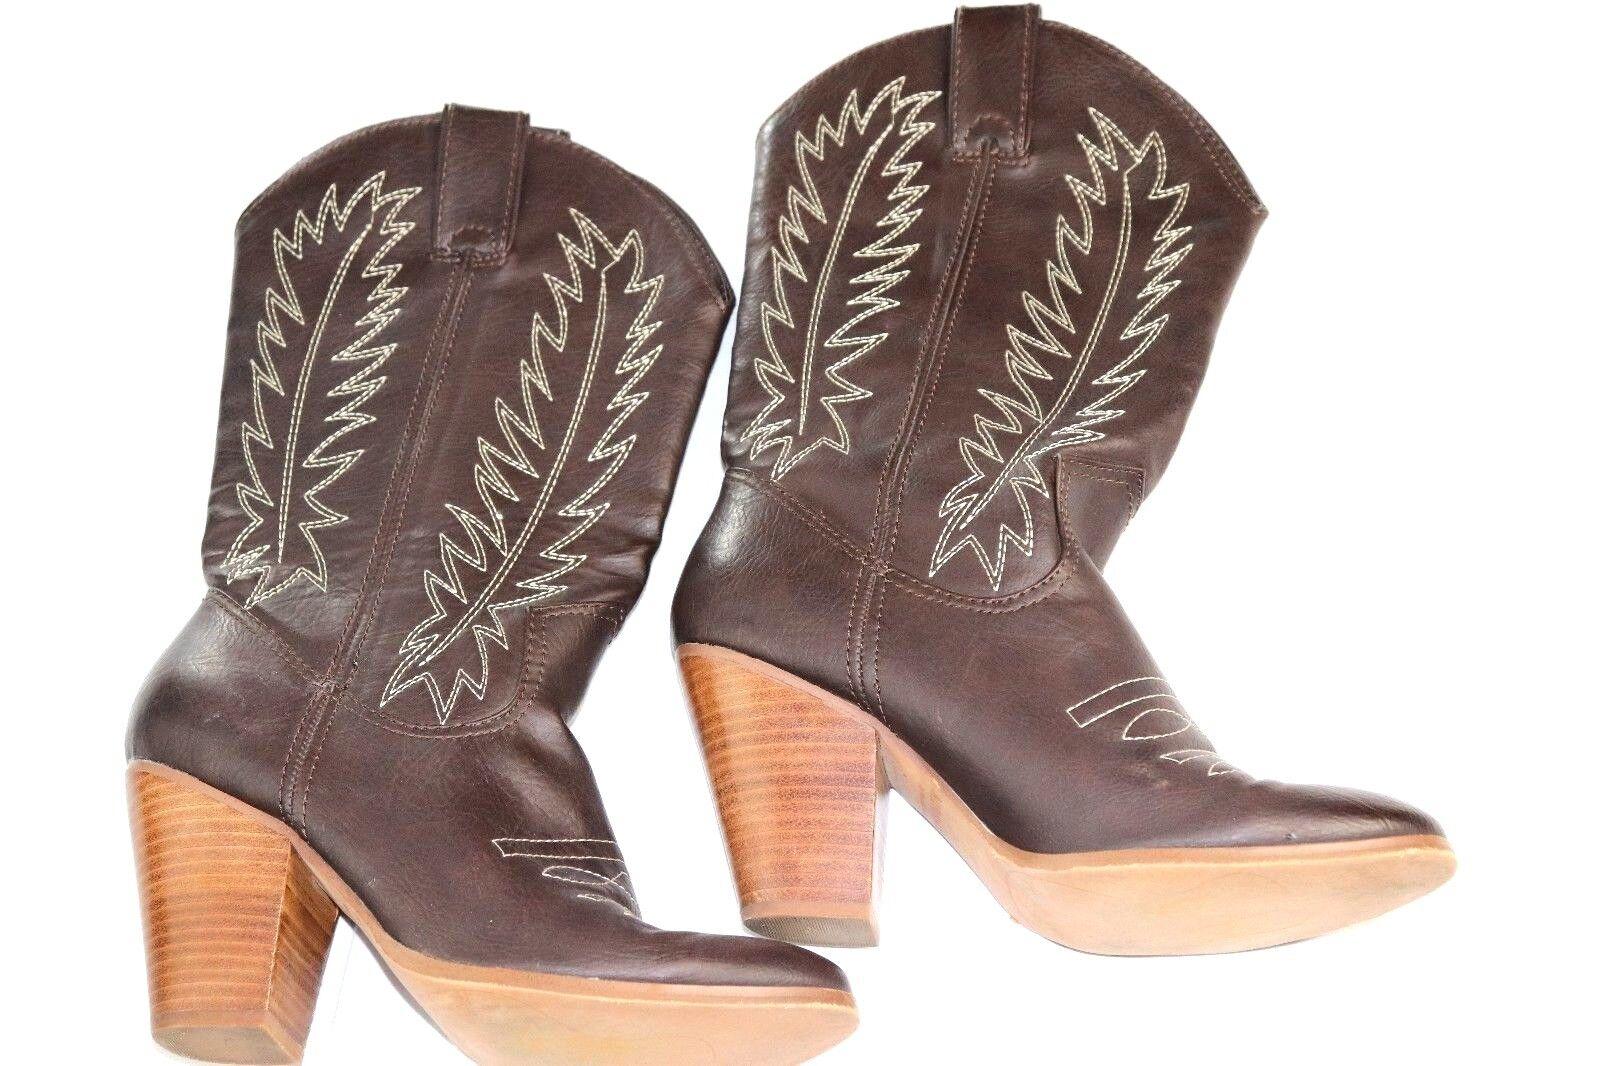 Miranda Lambert Cowgirl Women's Brown Design Stitched Cowboy aka Cowgirl Lambert Boots Sz 9M 03877e